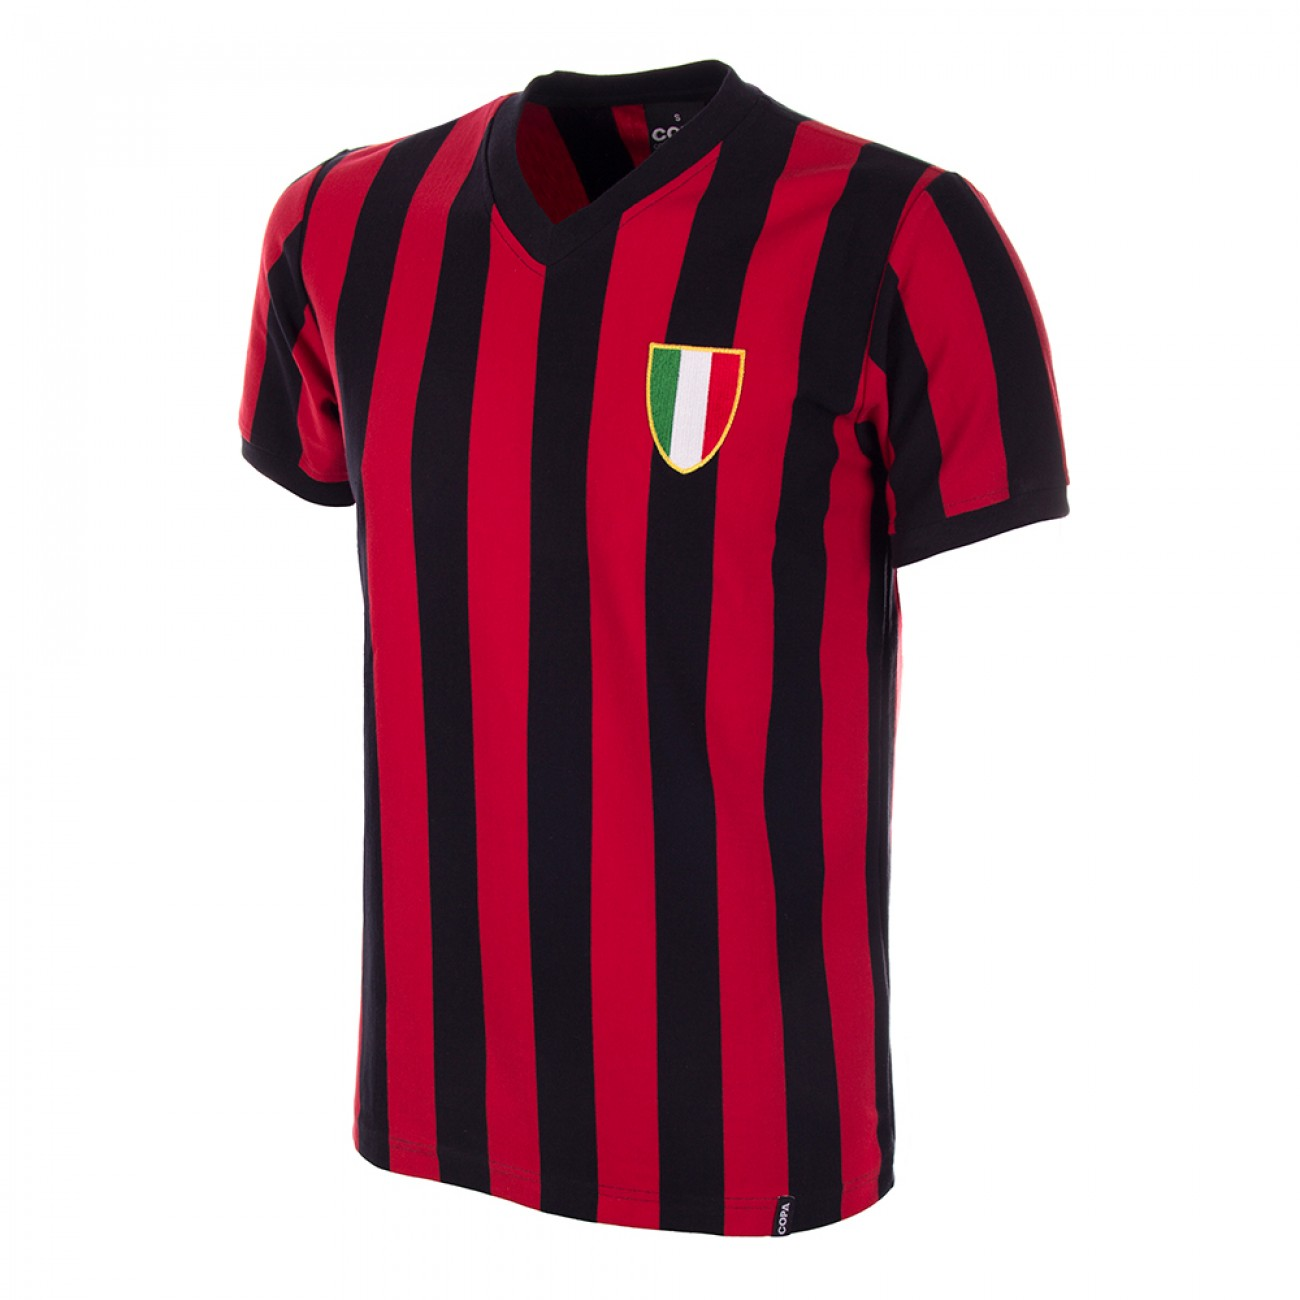 http://www.retrofootball.es/ropa-de-futbol/camiseta-retro-milan-a-os-60.html